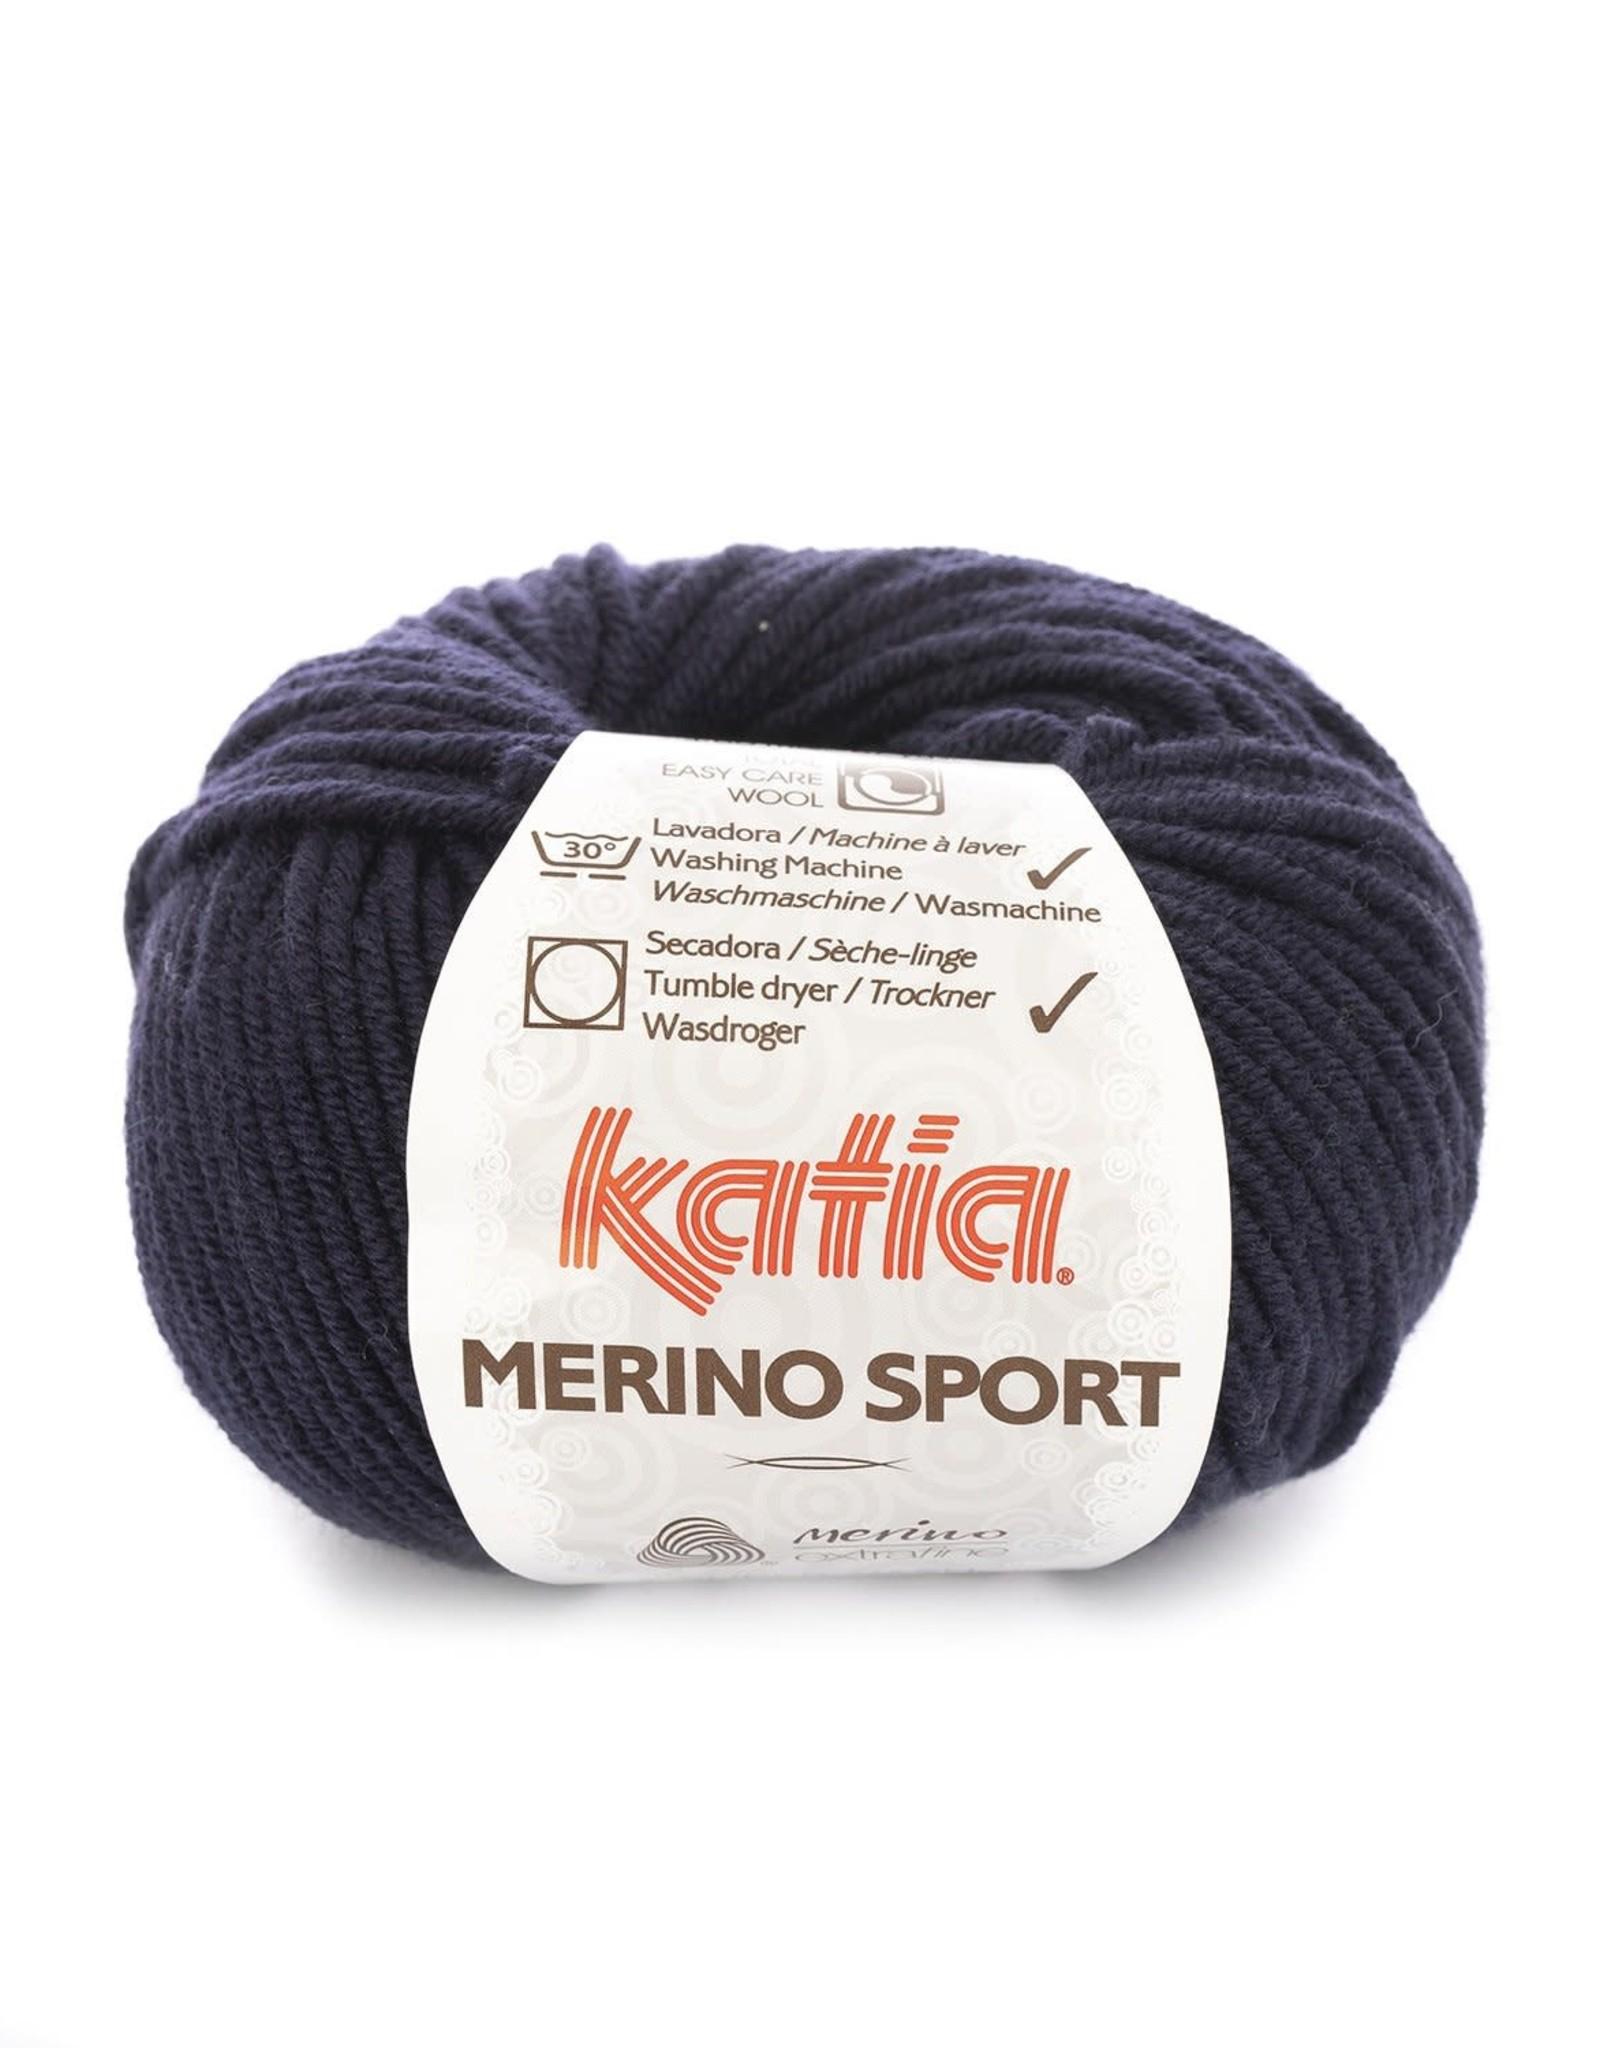 Katia Katia Merino Sport Donkerblauw 5